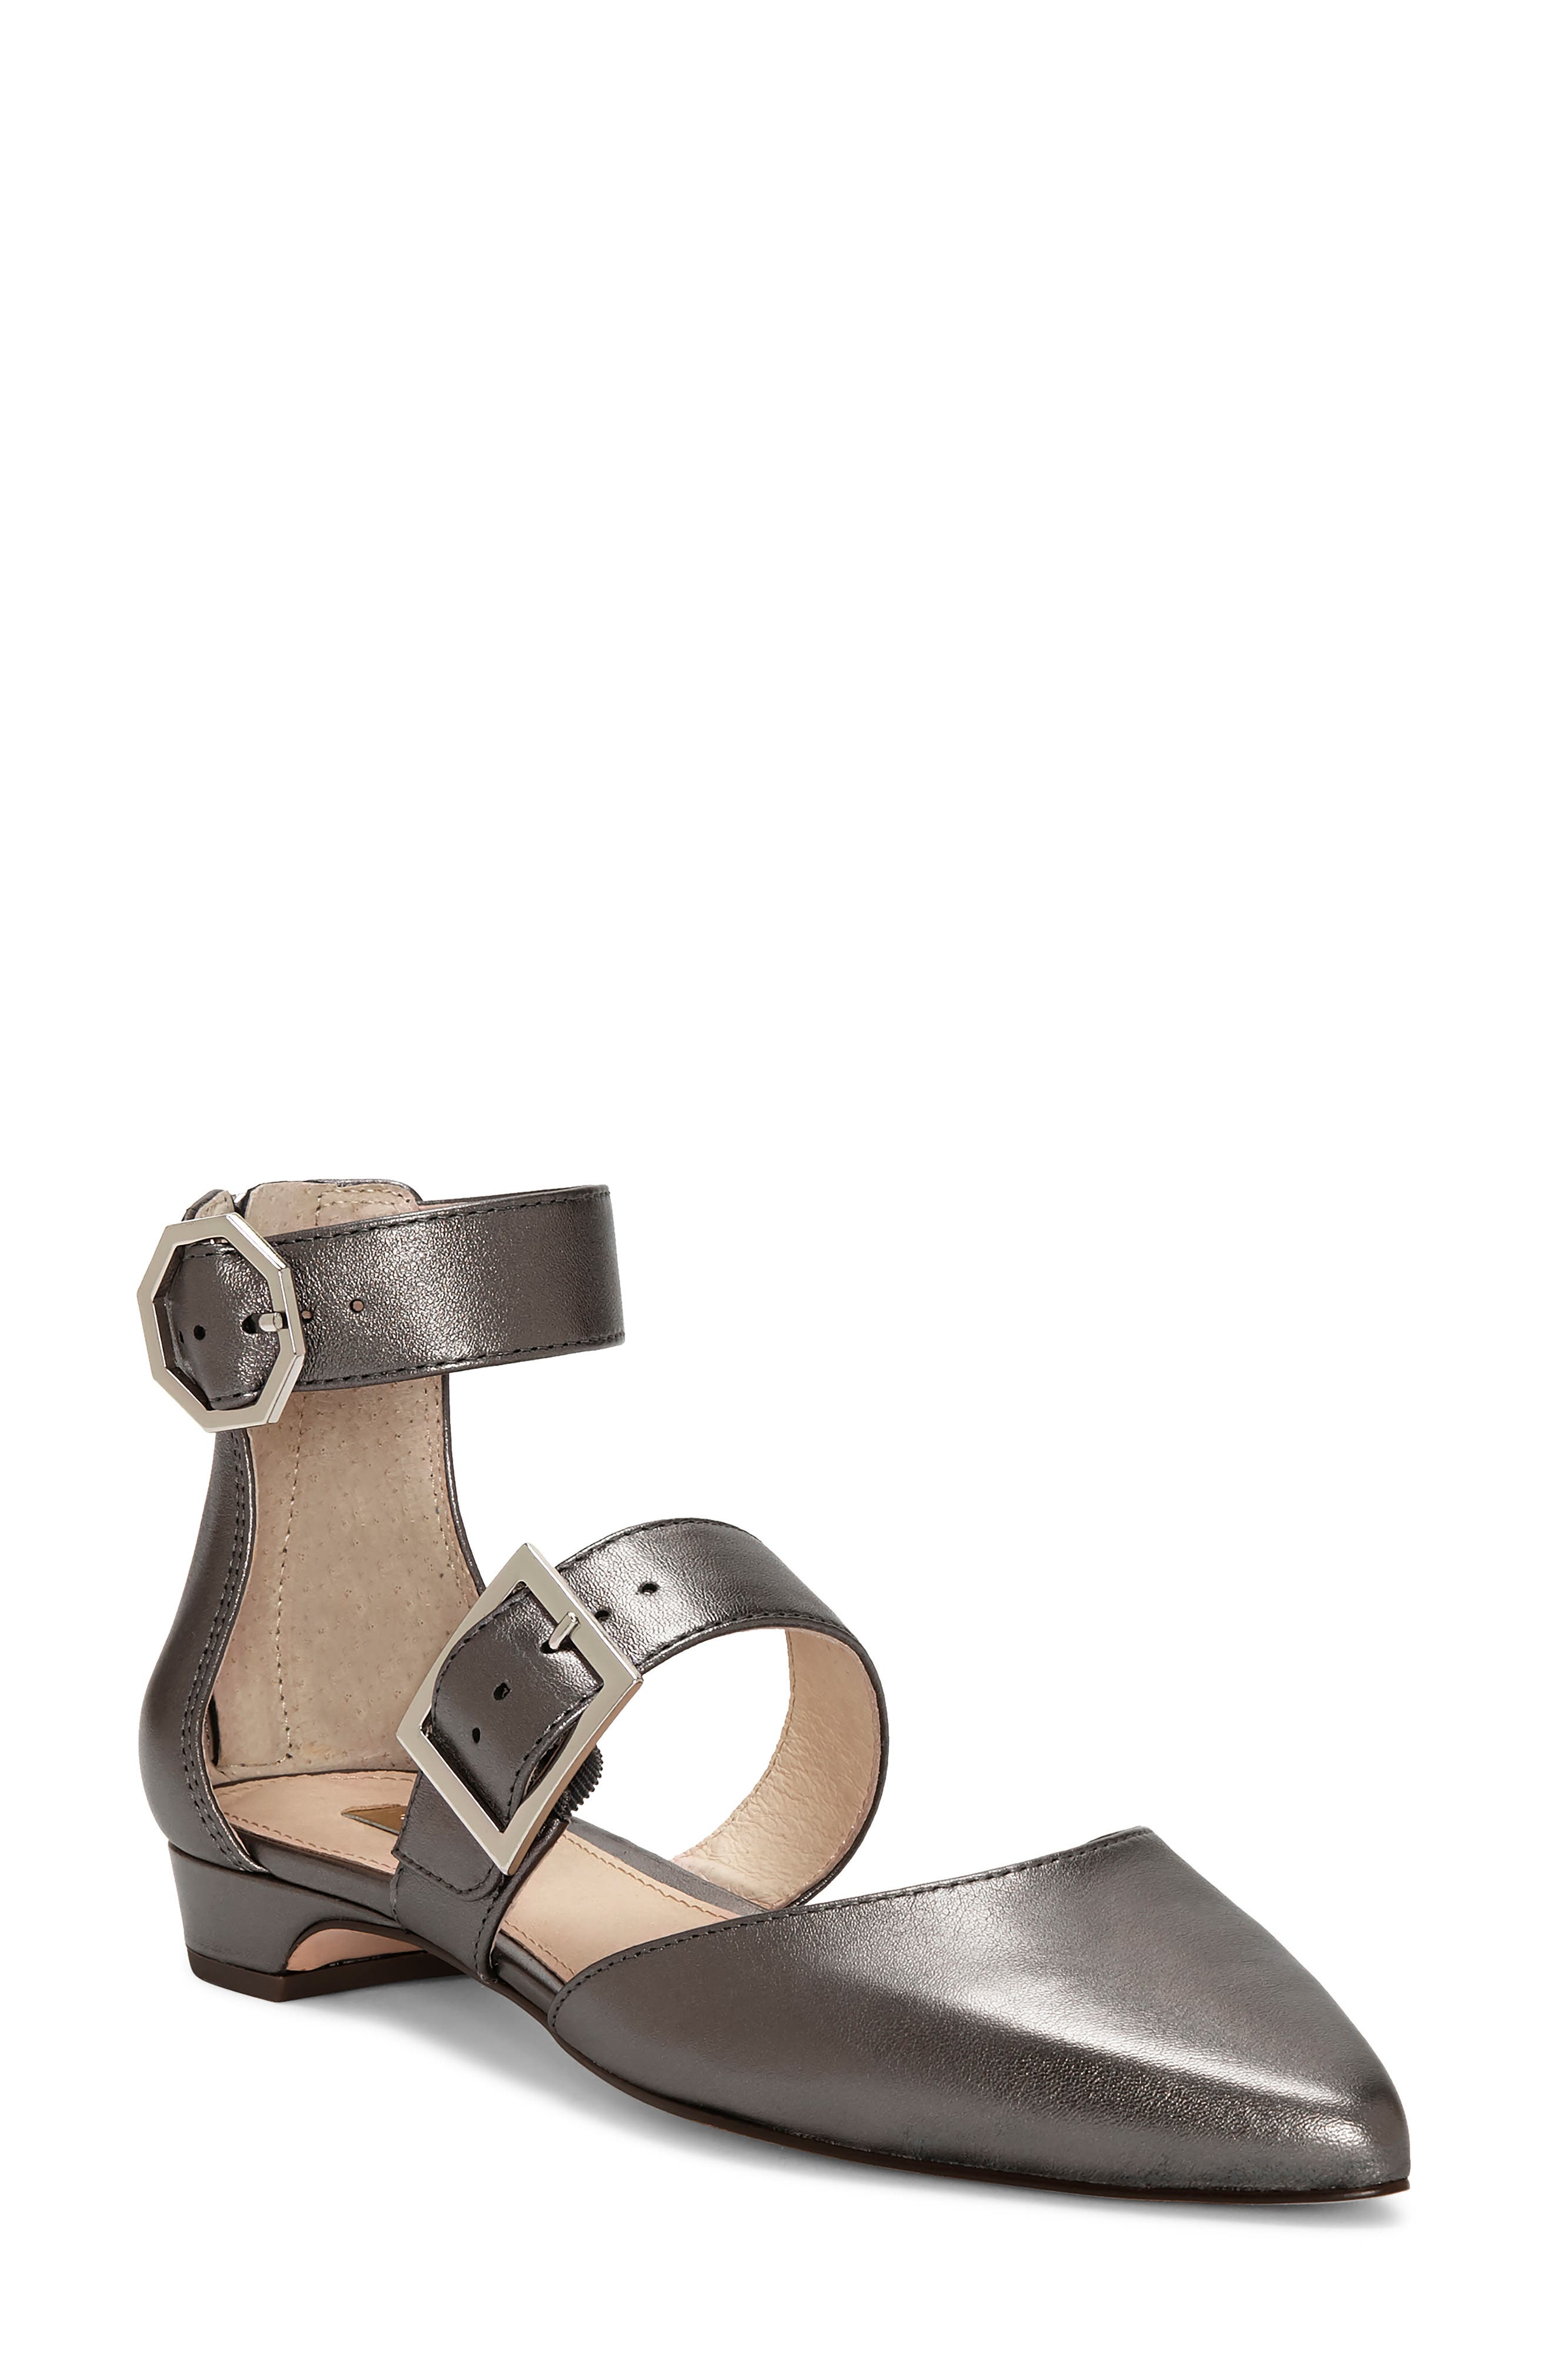 Louise Et Cie Corriett Ankle Strap Sandal- Metallic